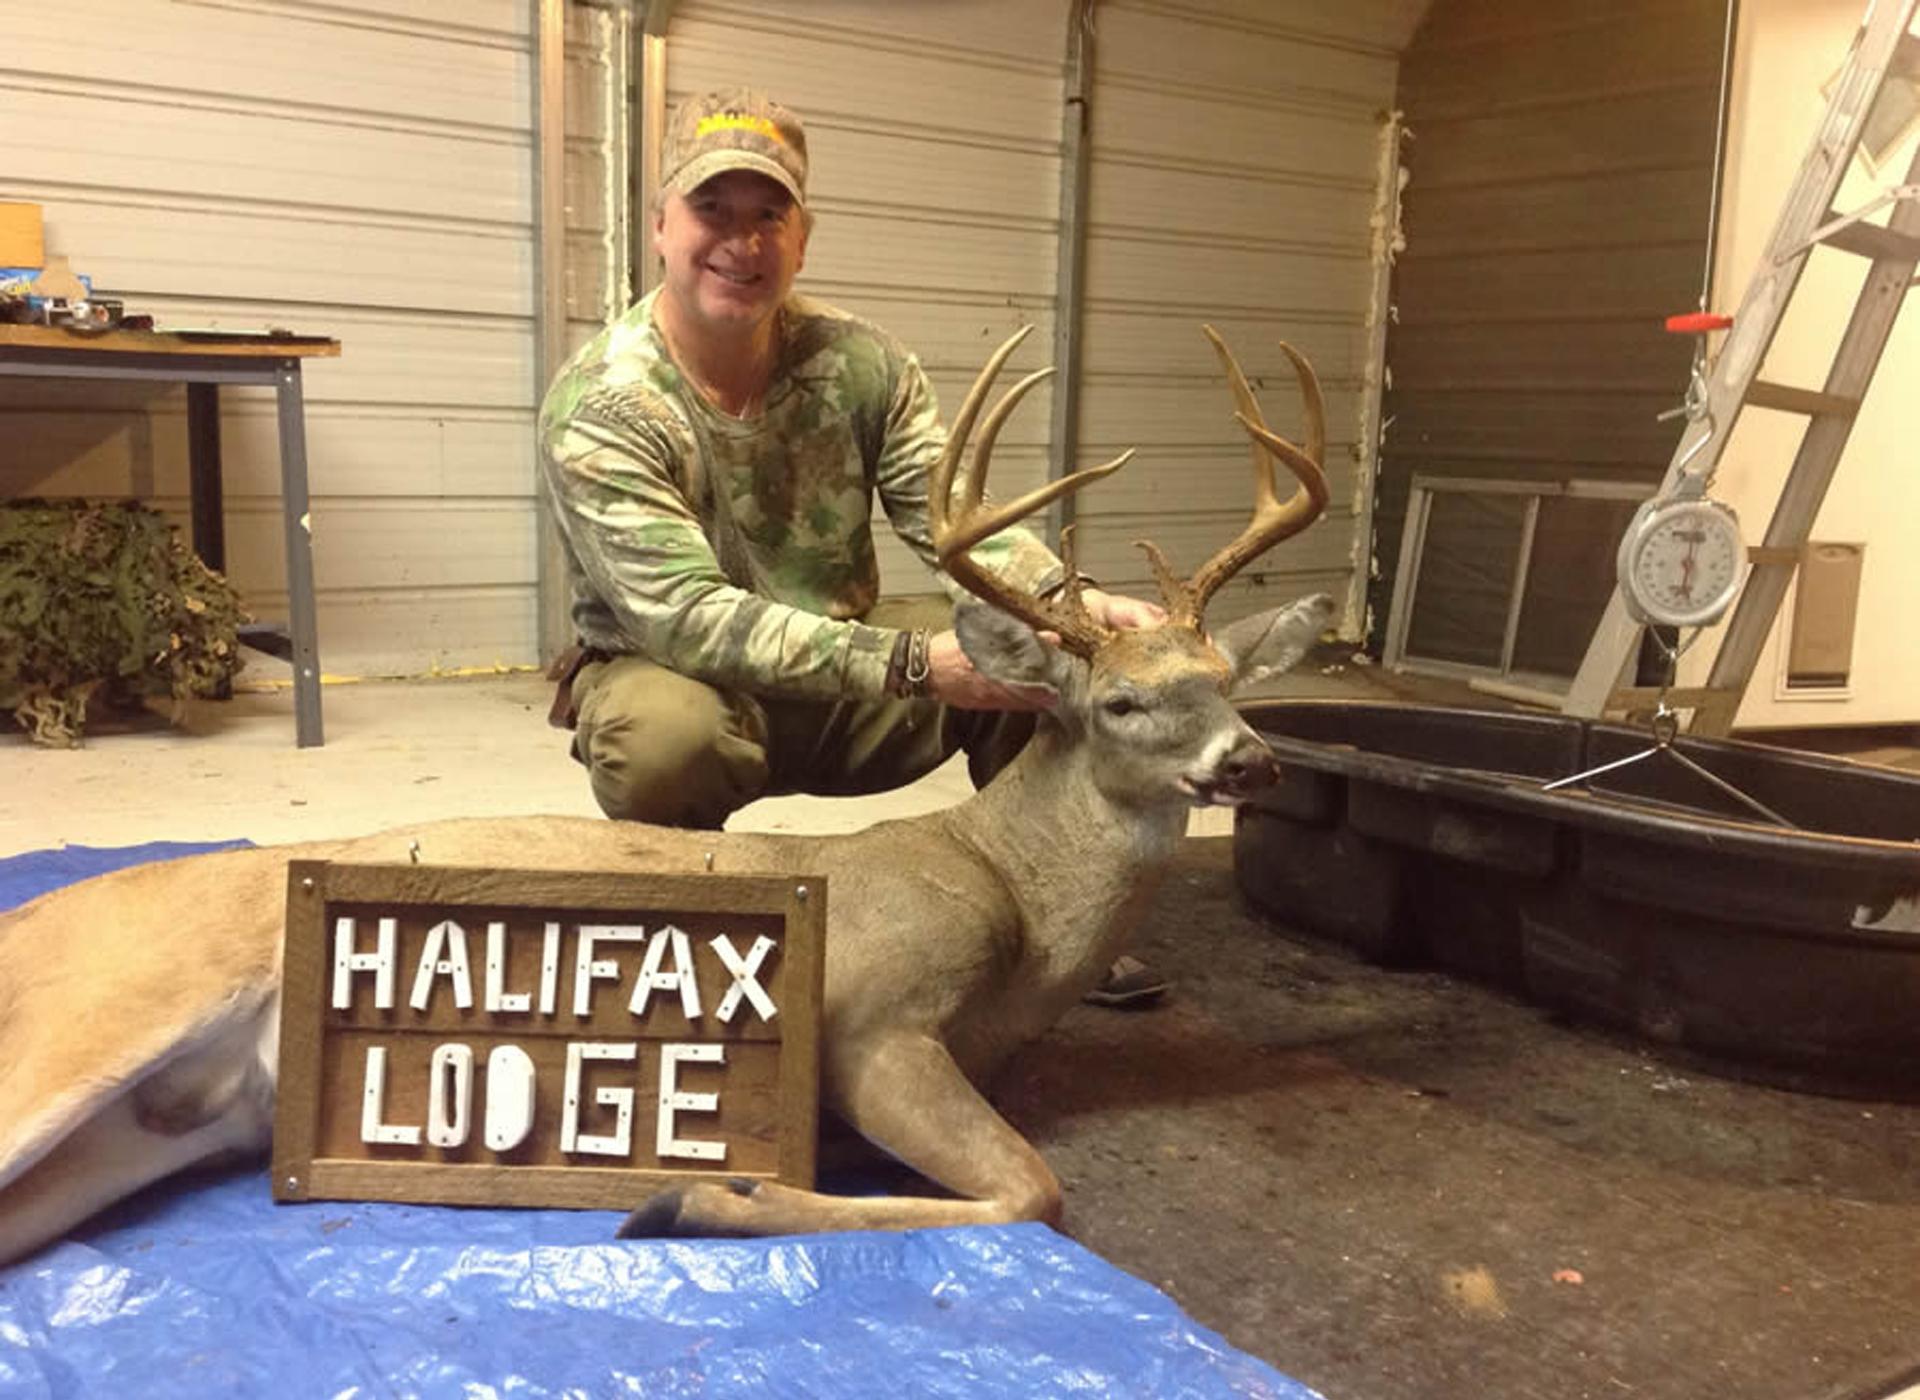 Deer hunting at Halifax lodge, NC